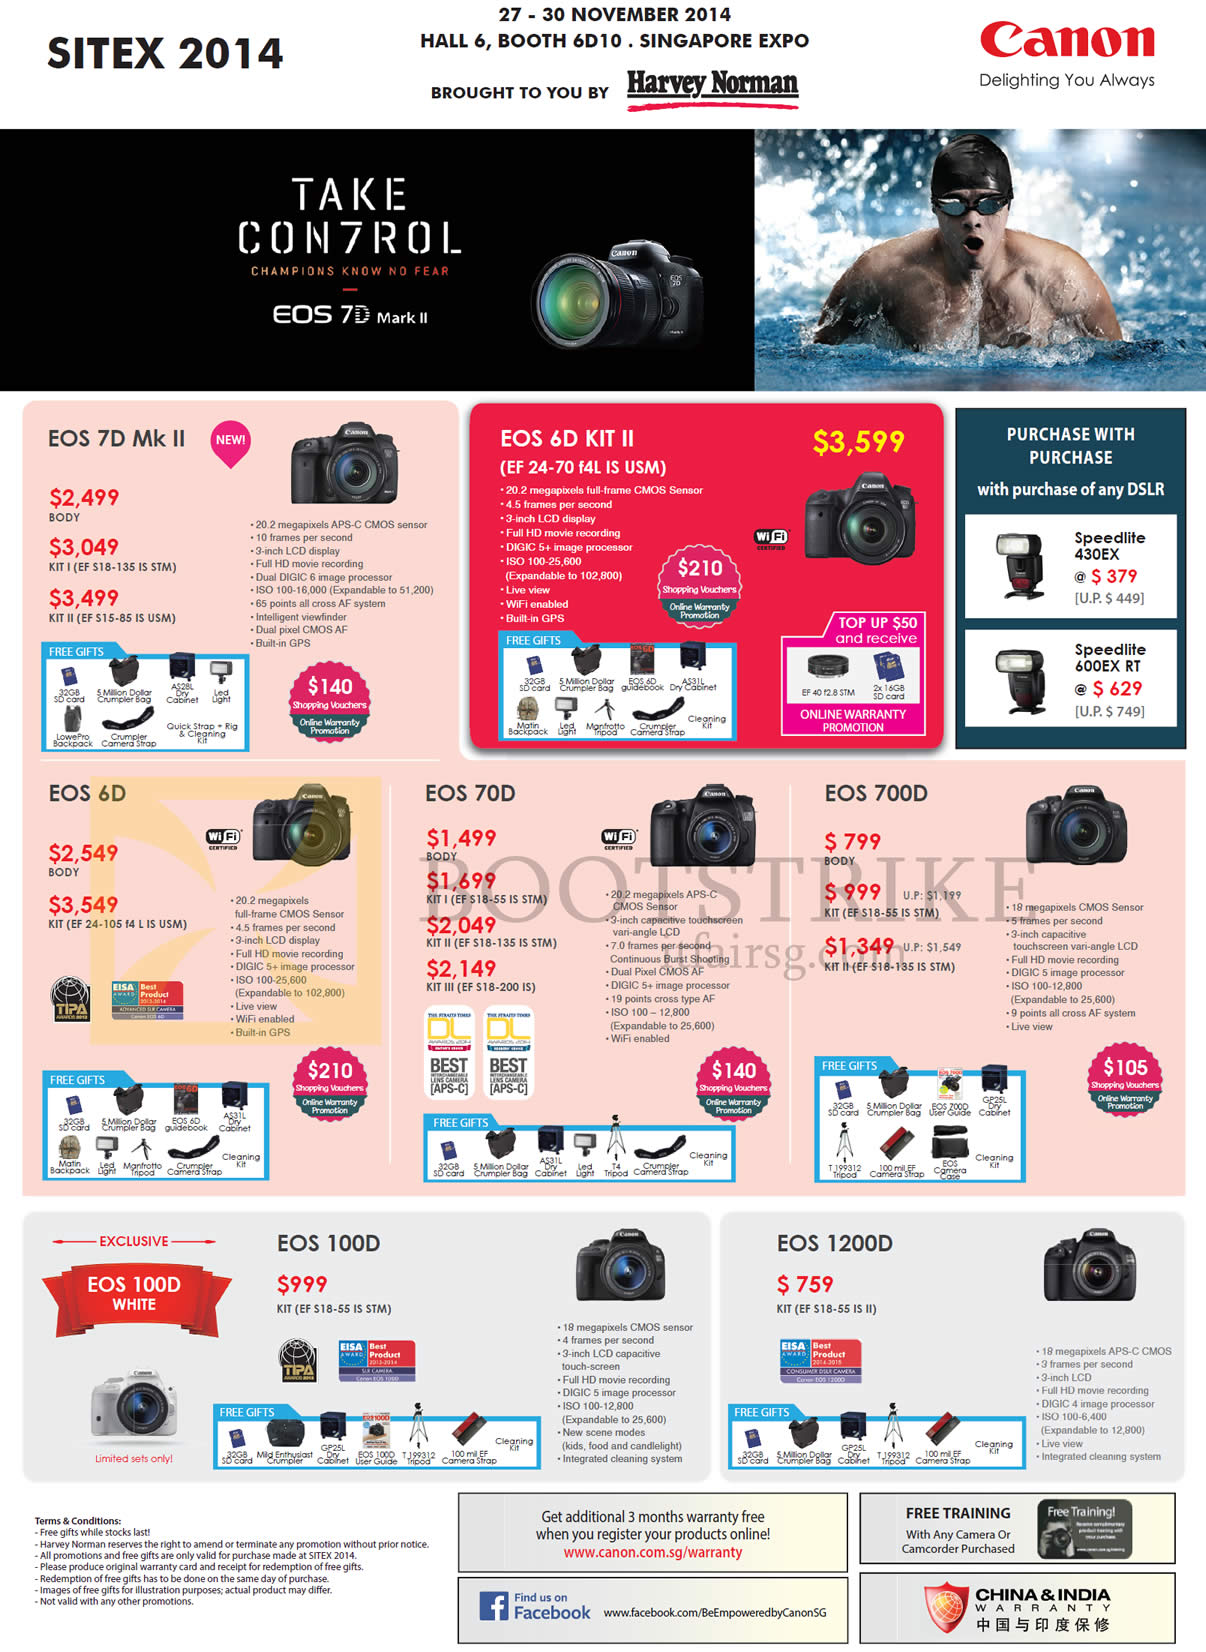 Canon Digital Cameras DSLR EOS 7D MK II, EOS 6D, EOS 70D, EOS 700D, EOS 100D, EOS 1200D